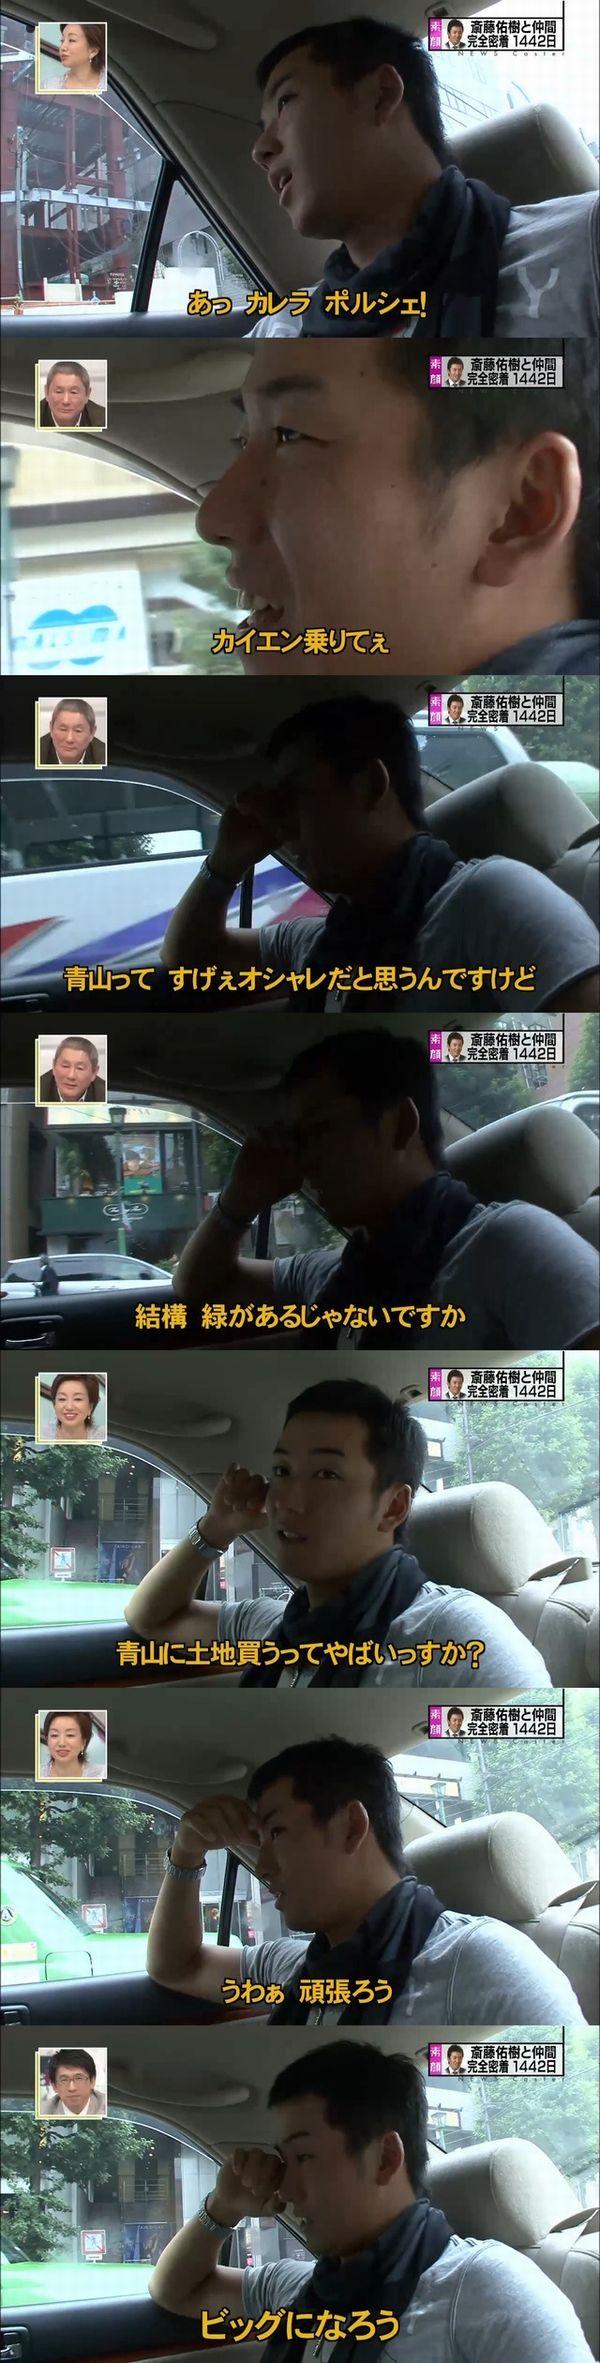 https://livedoor.blogimg.jp/saito234-affili4/imgs/c/a/ca53321b.jpg